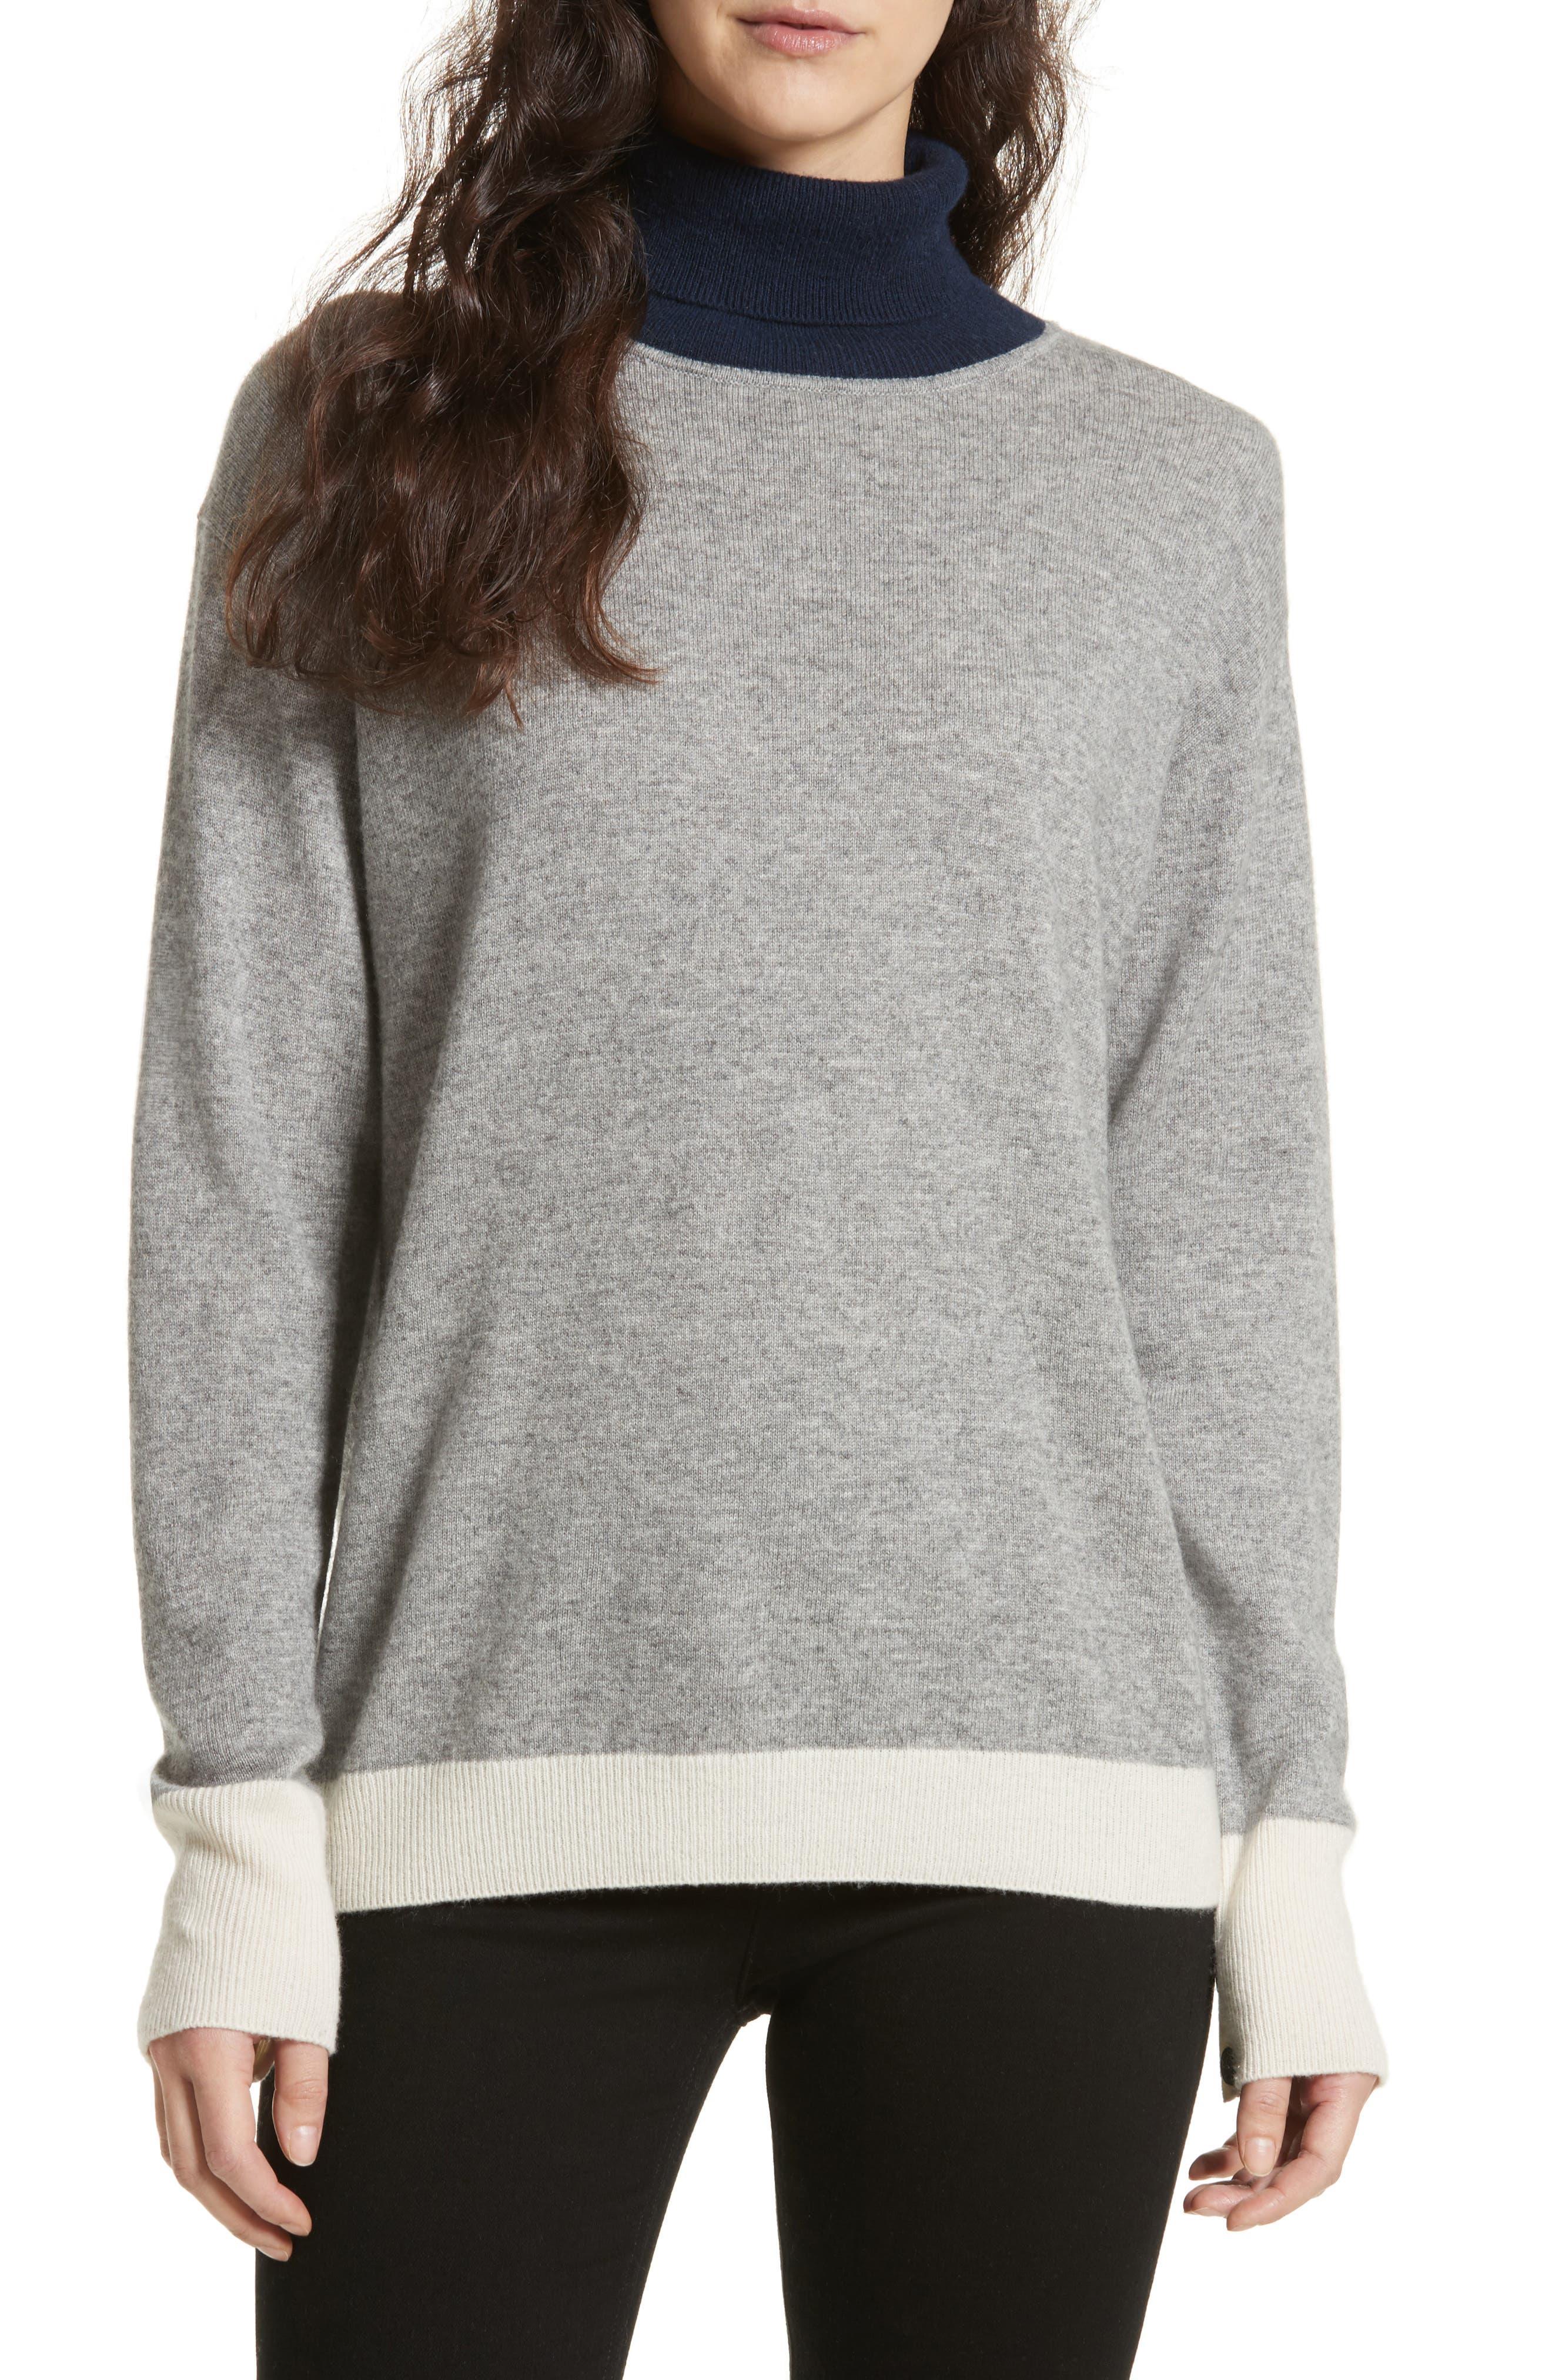 Rhea Wool & Cashmere Turtleneck Sweater,                             Main thumbnail 1, color,                             Grey Heather